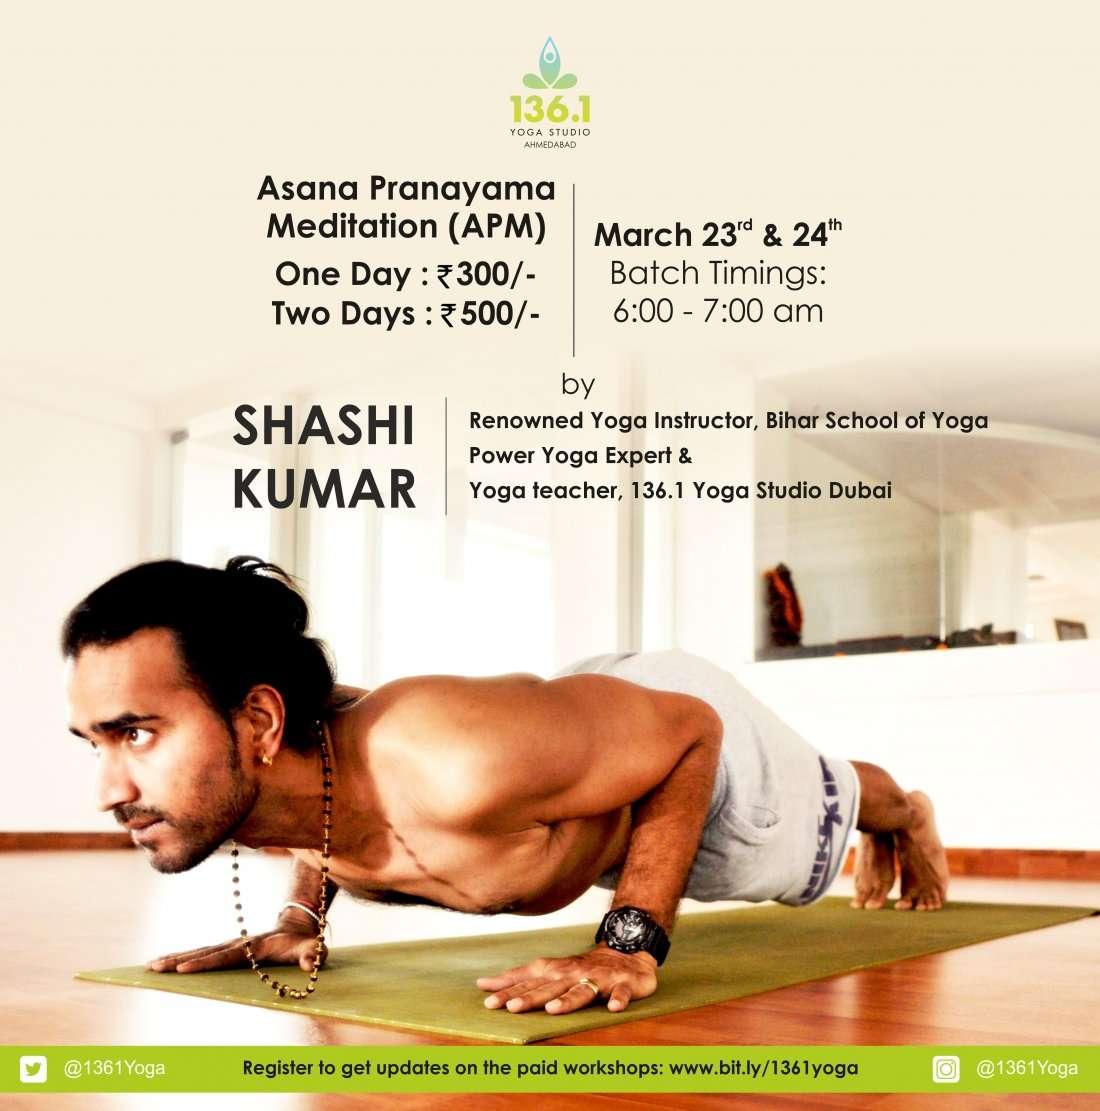 https://creativeyatra.com/wp-content/uploads/2018/03/Asana-Pranayam-Meditation-by-Shashi-Kumar.jpg